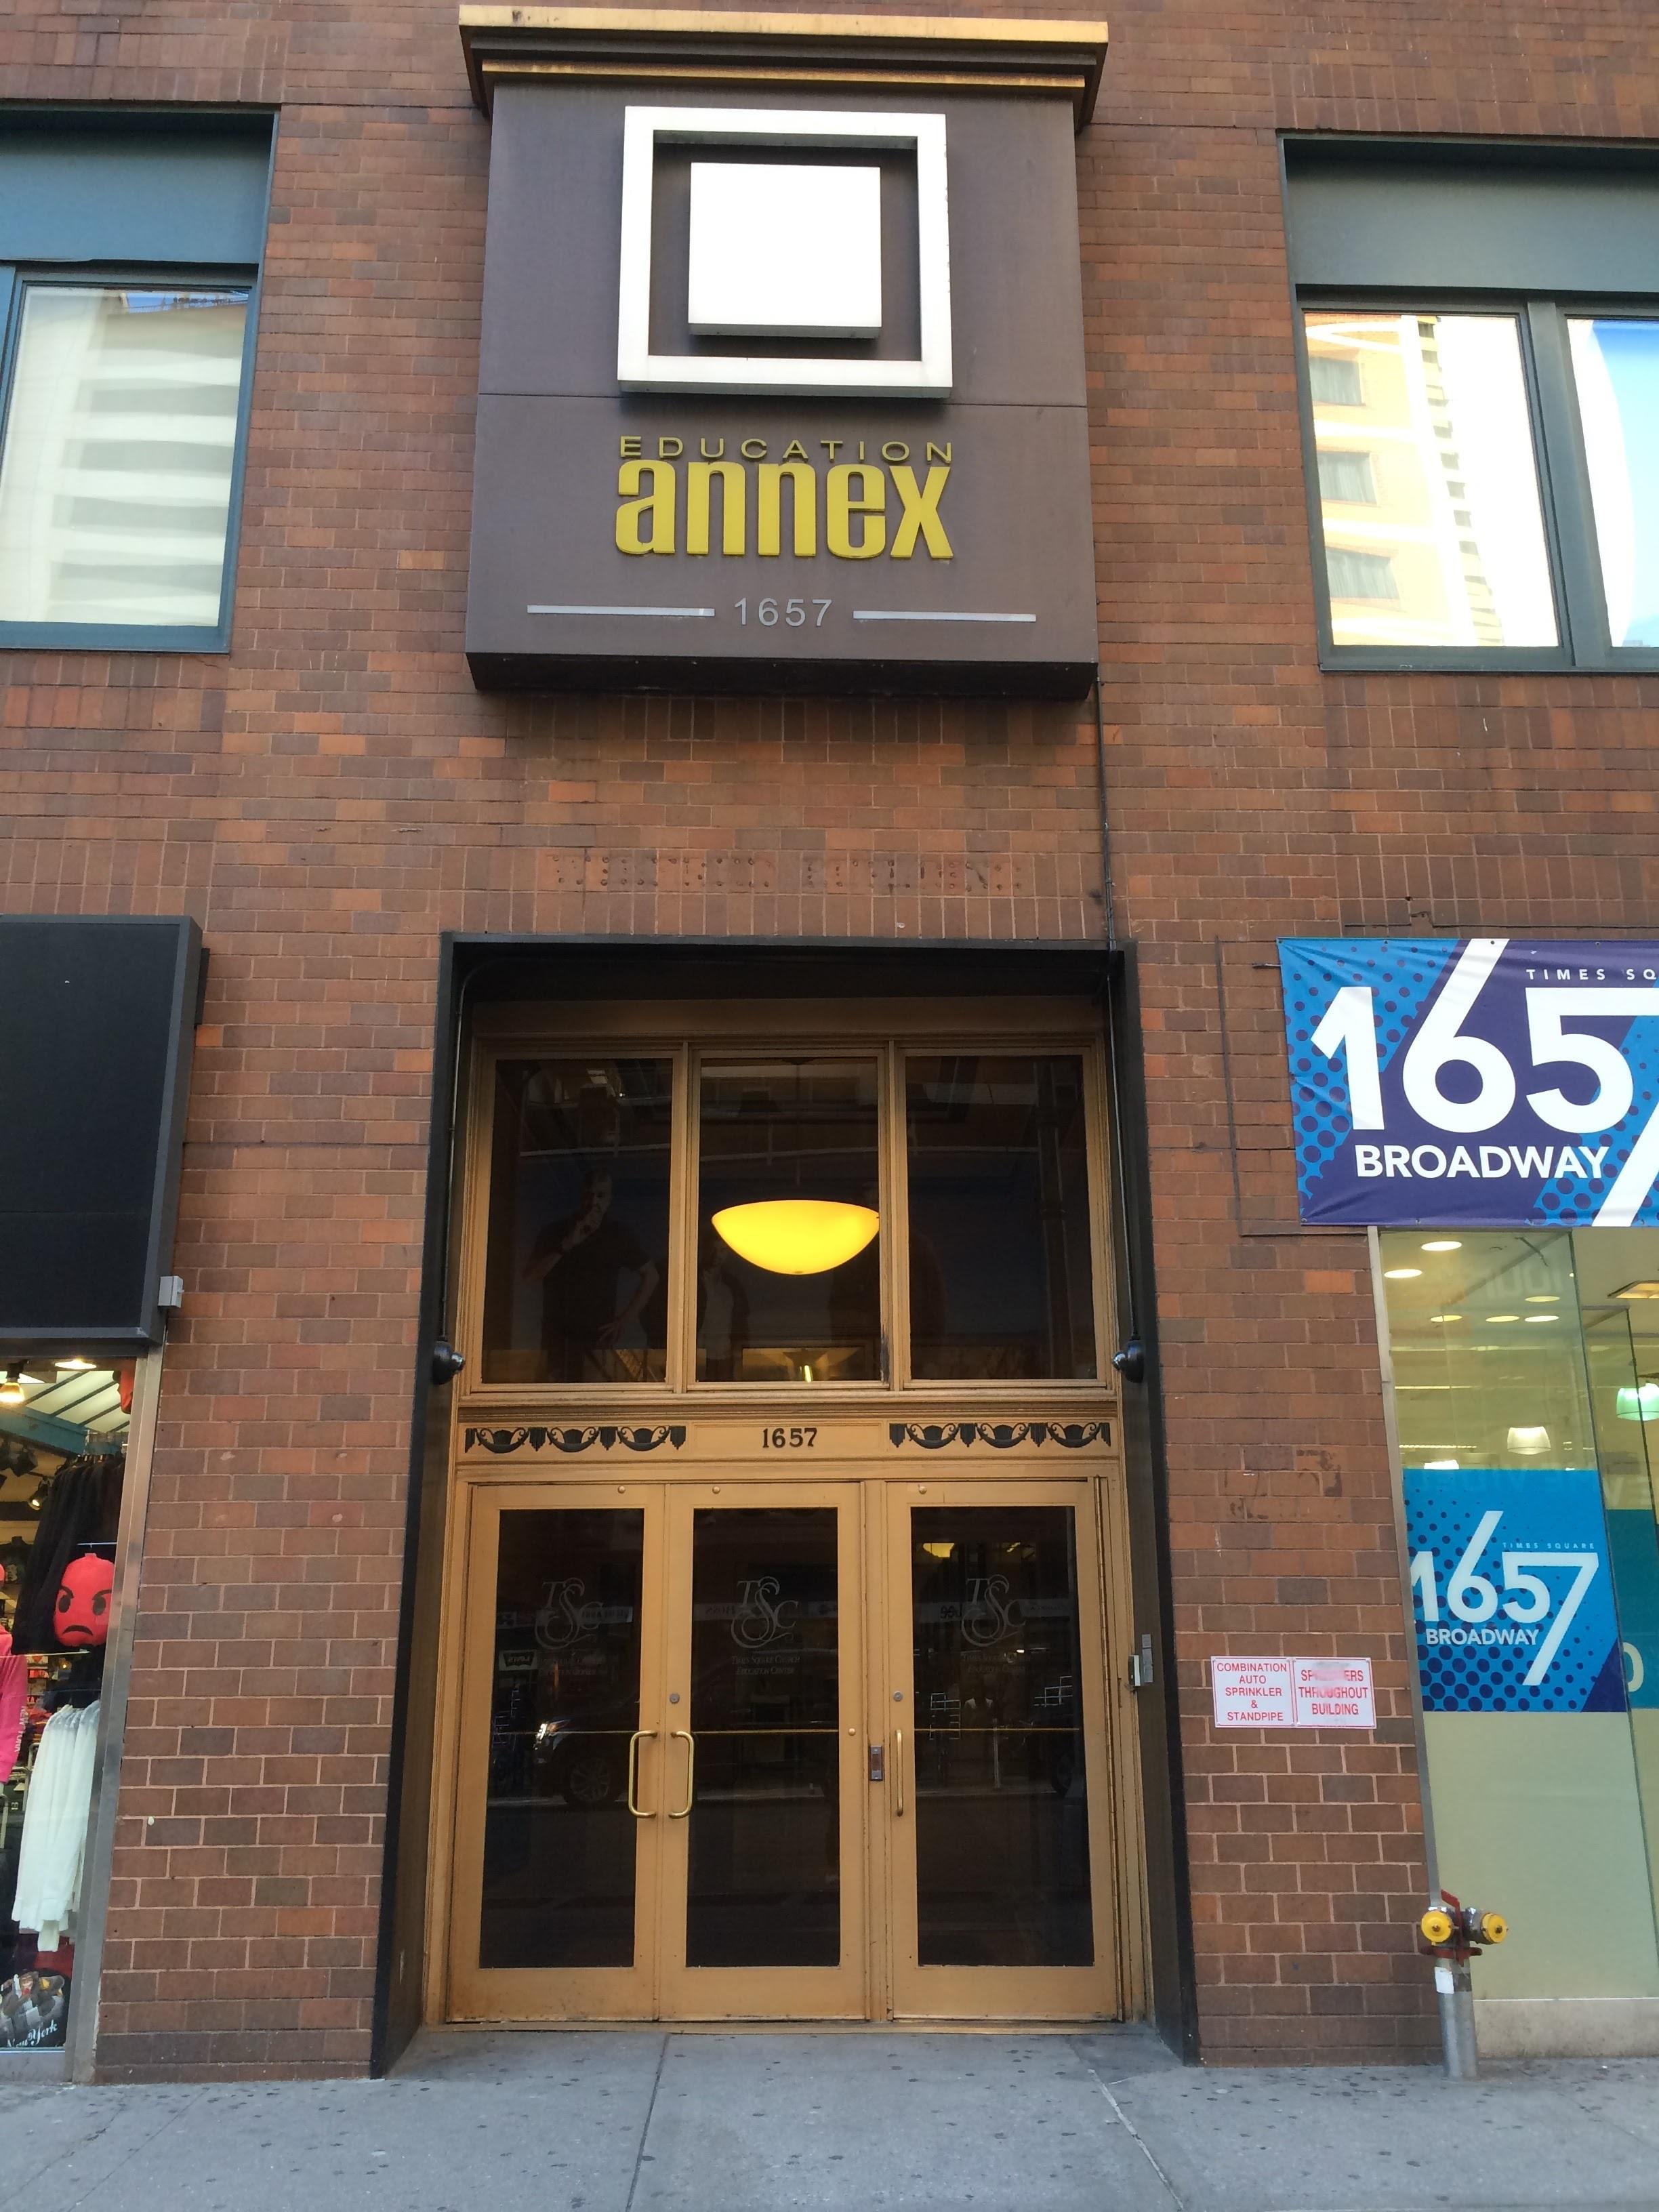 22. Times Square Church Education Annex